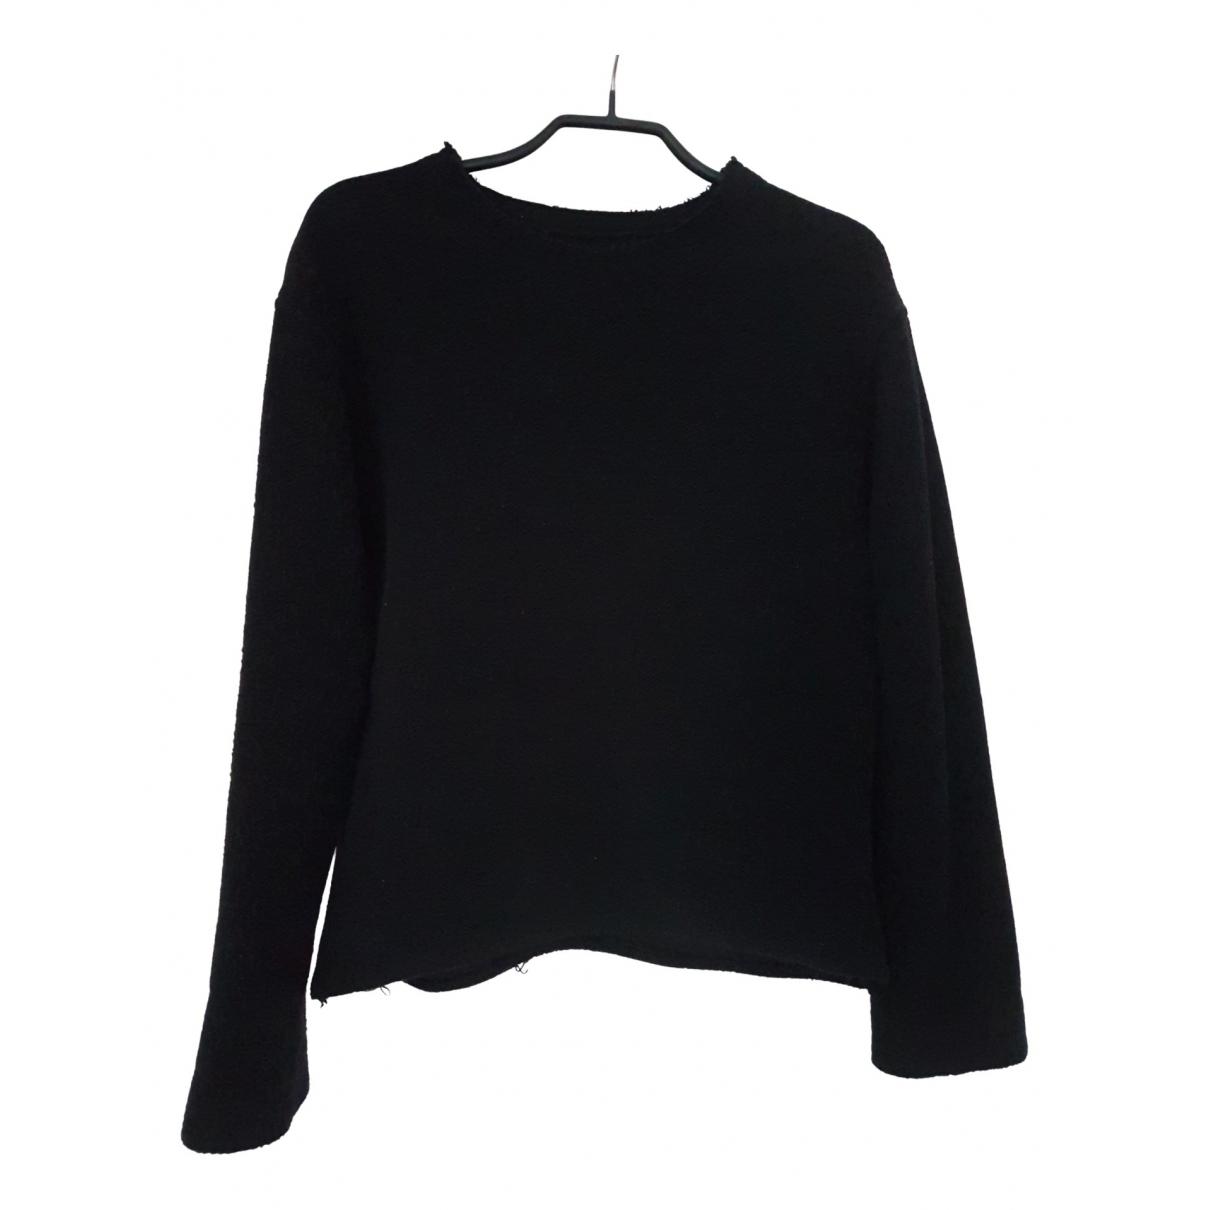 Simon Miller N Black Cotton Knitwear for Women 0 0-5